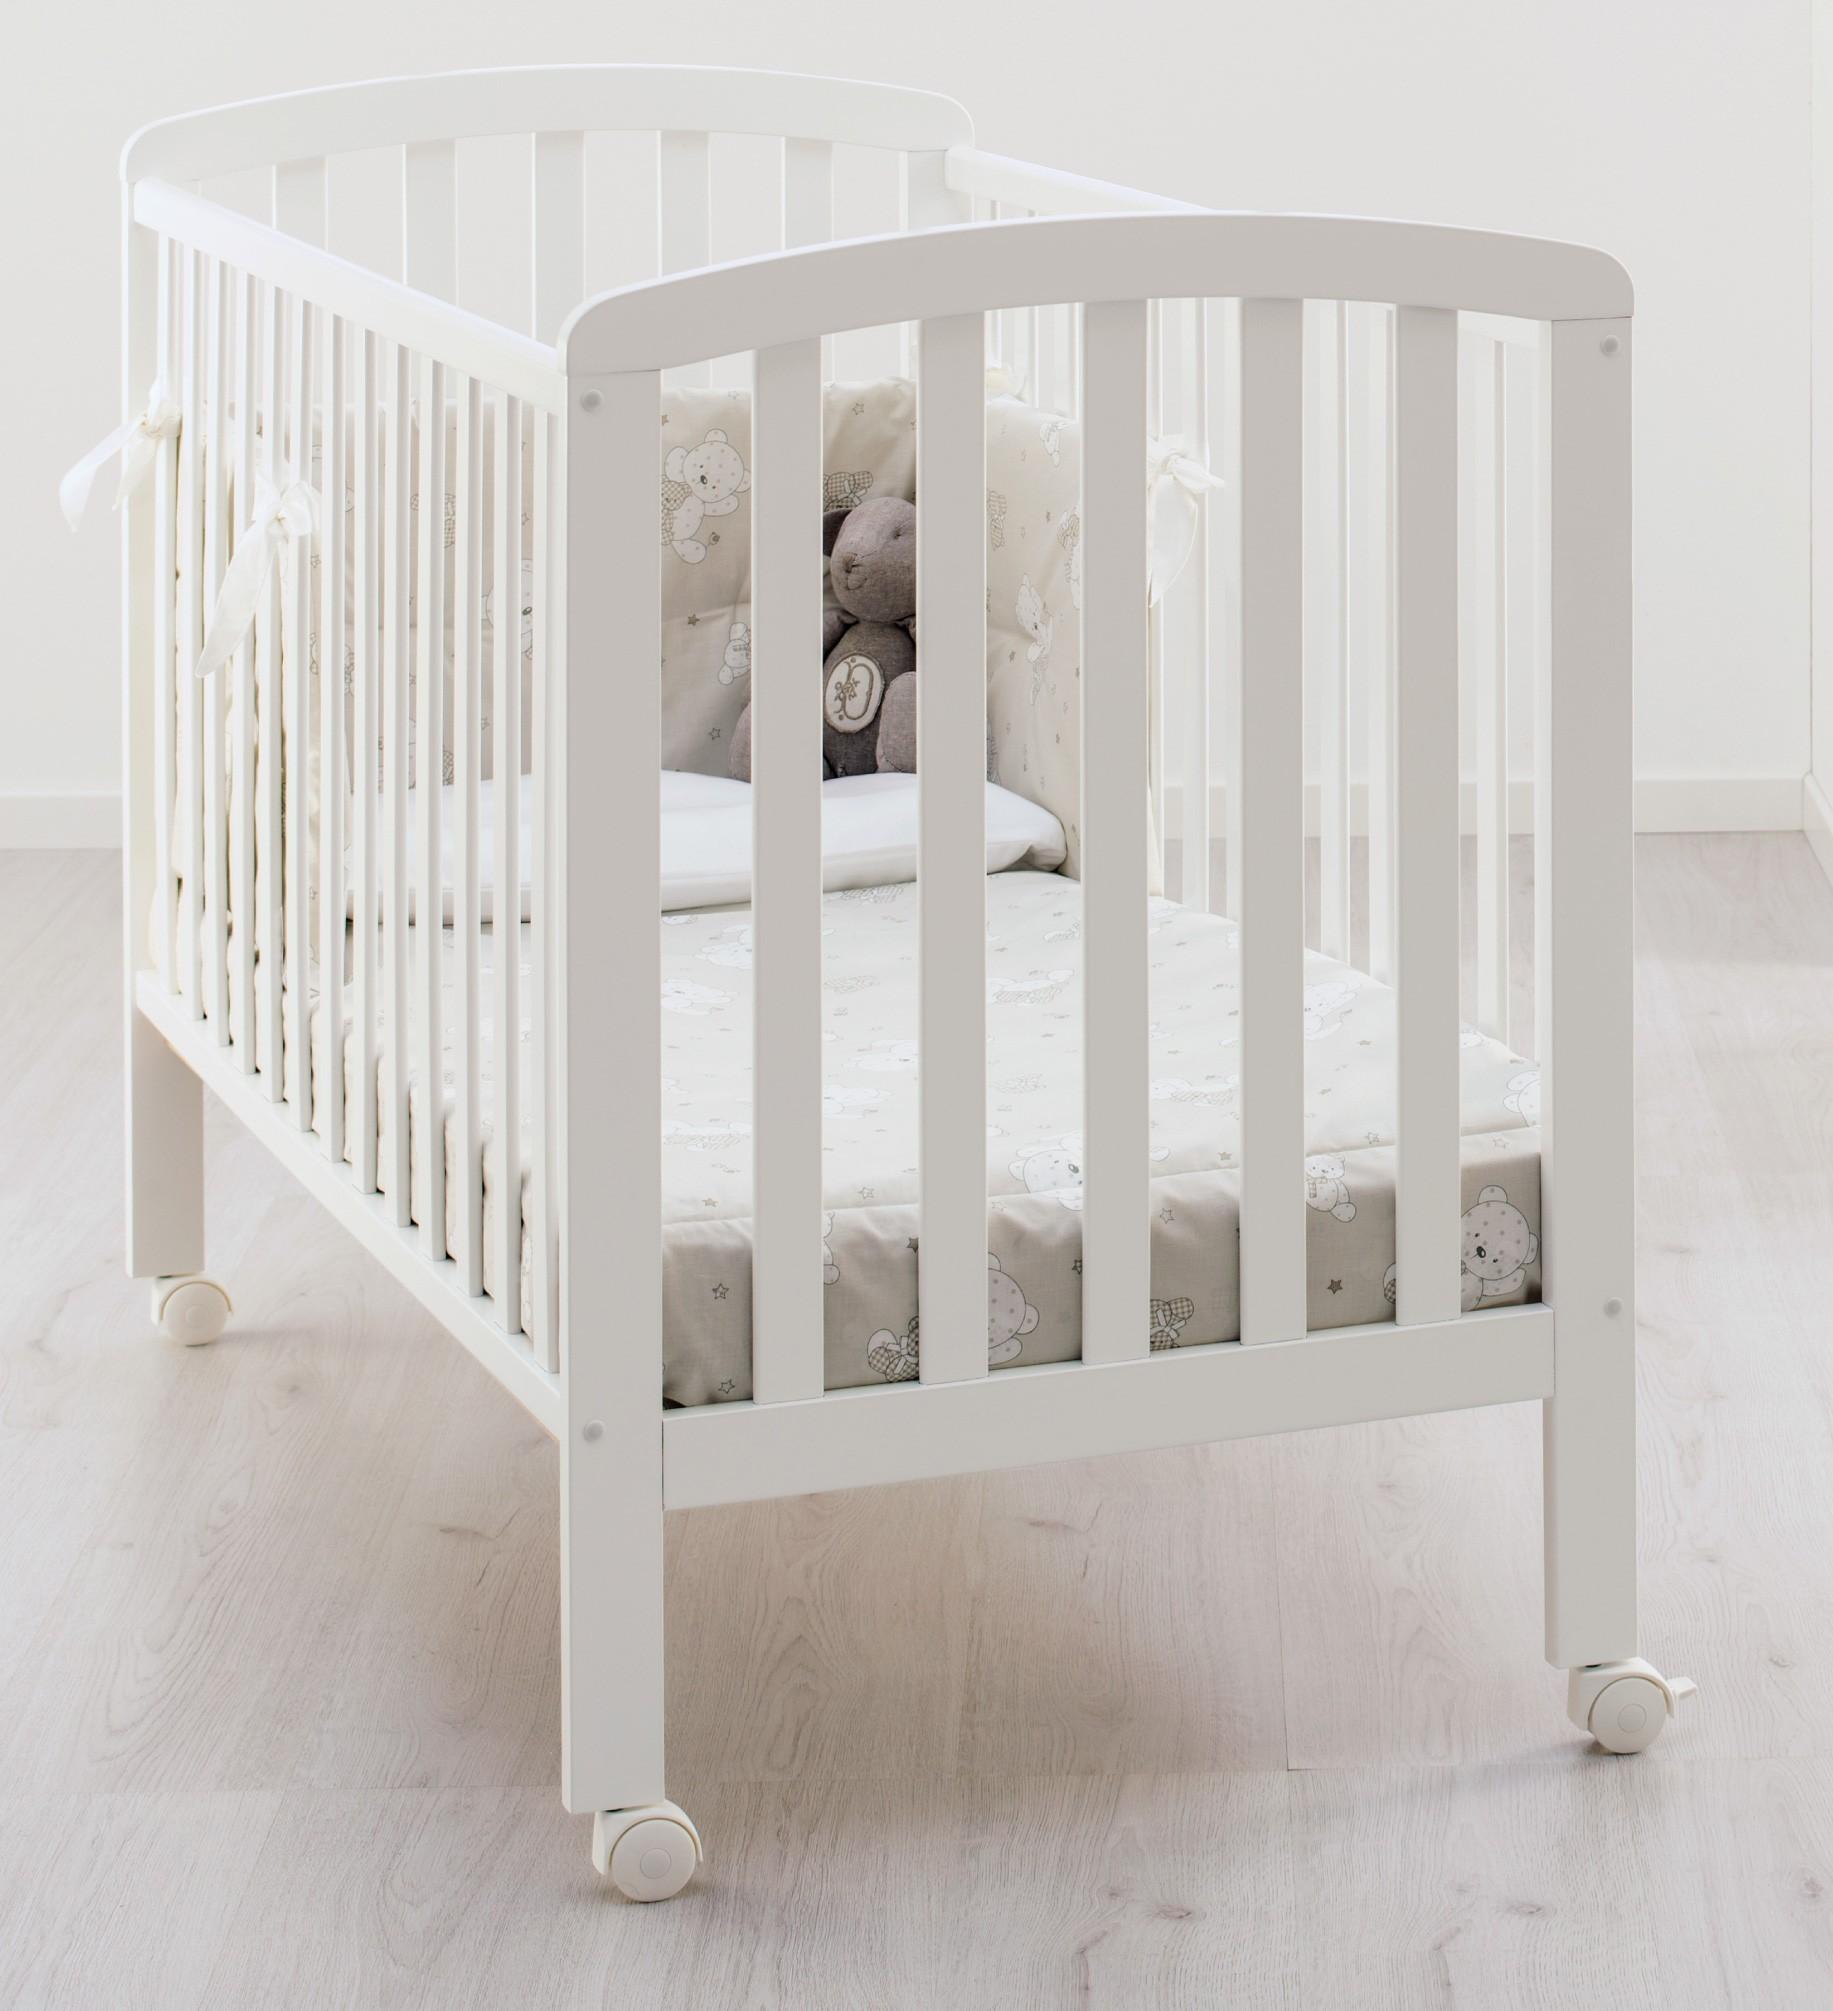 Azzurra Design Lit bébé Weekend